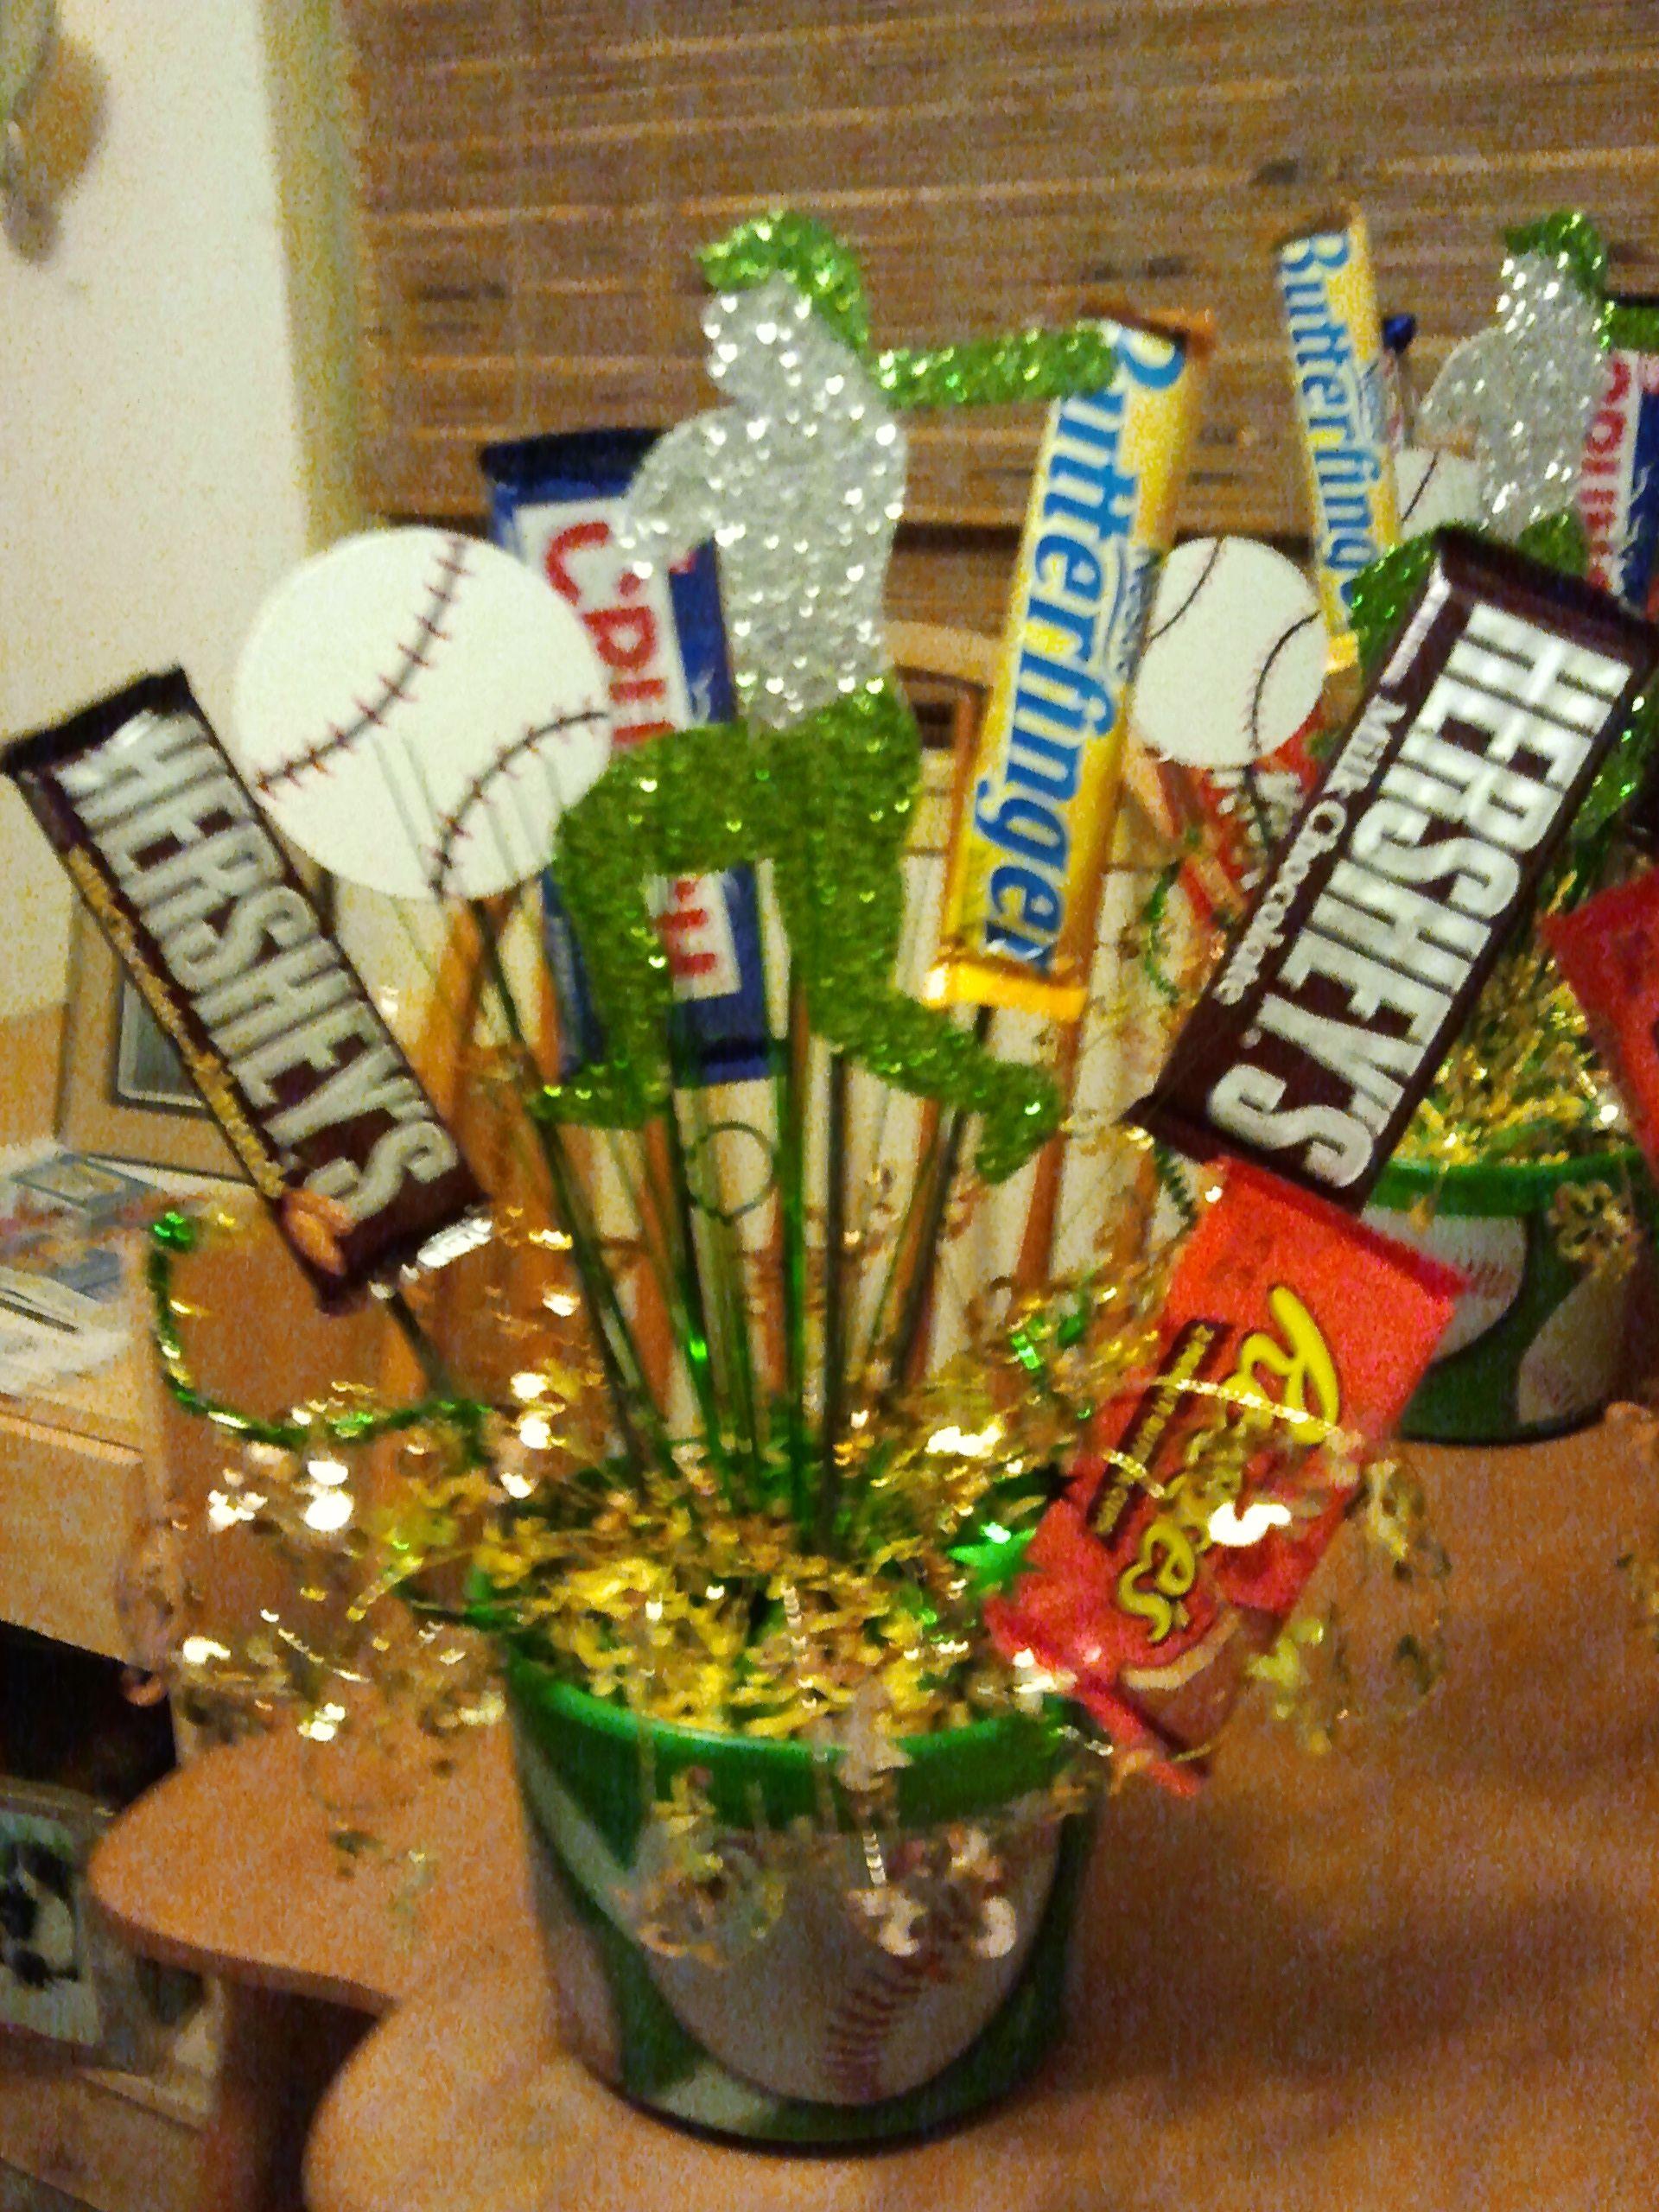 Baseball banquet centerpieces and